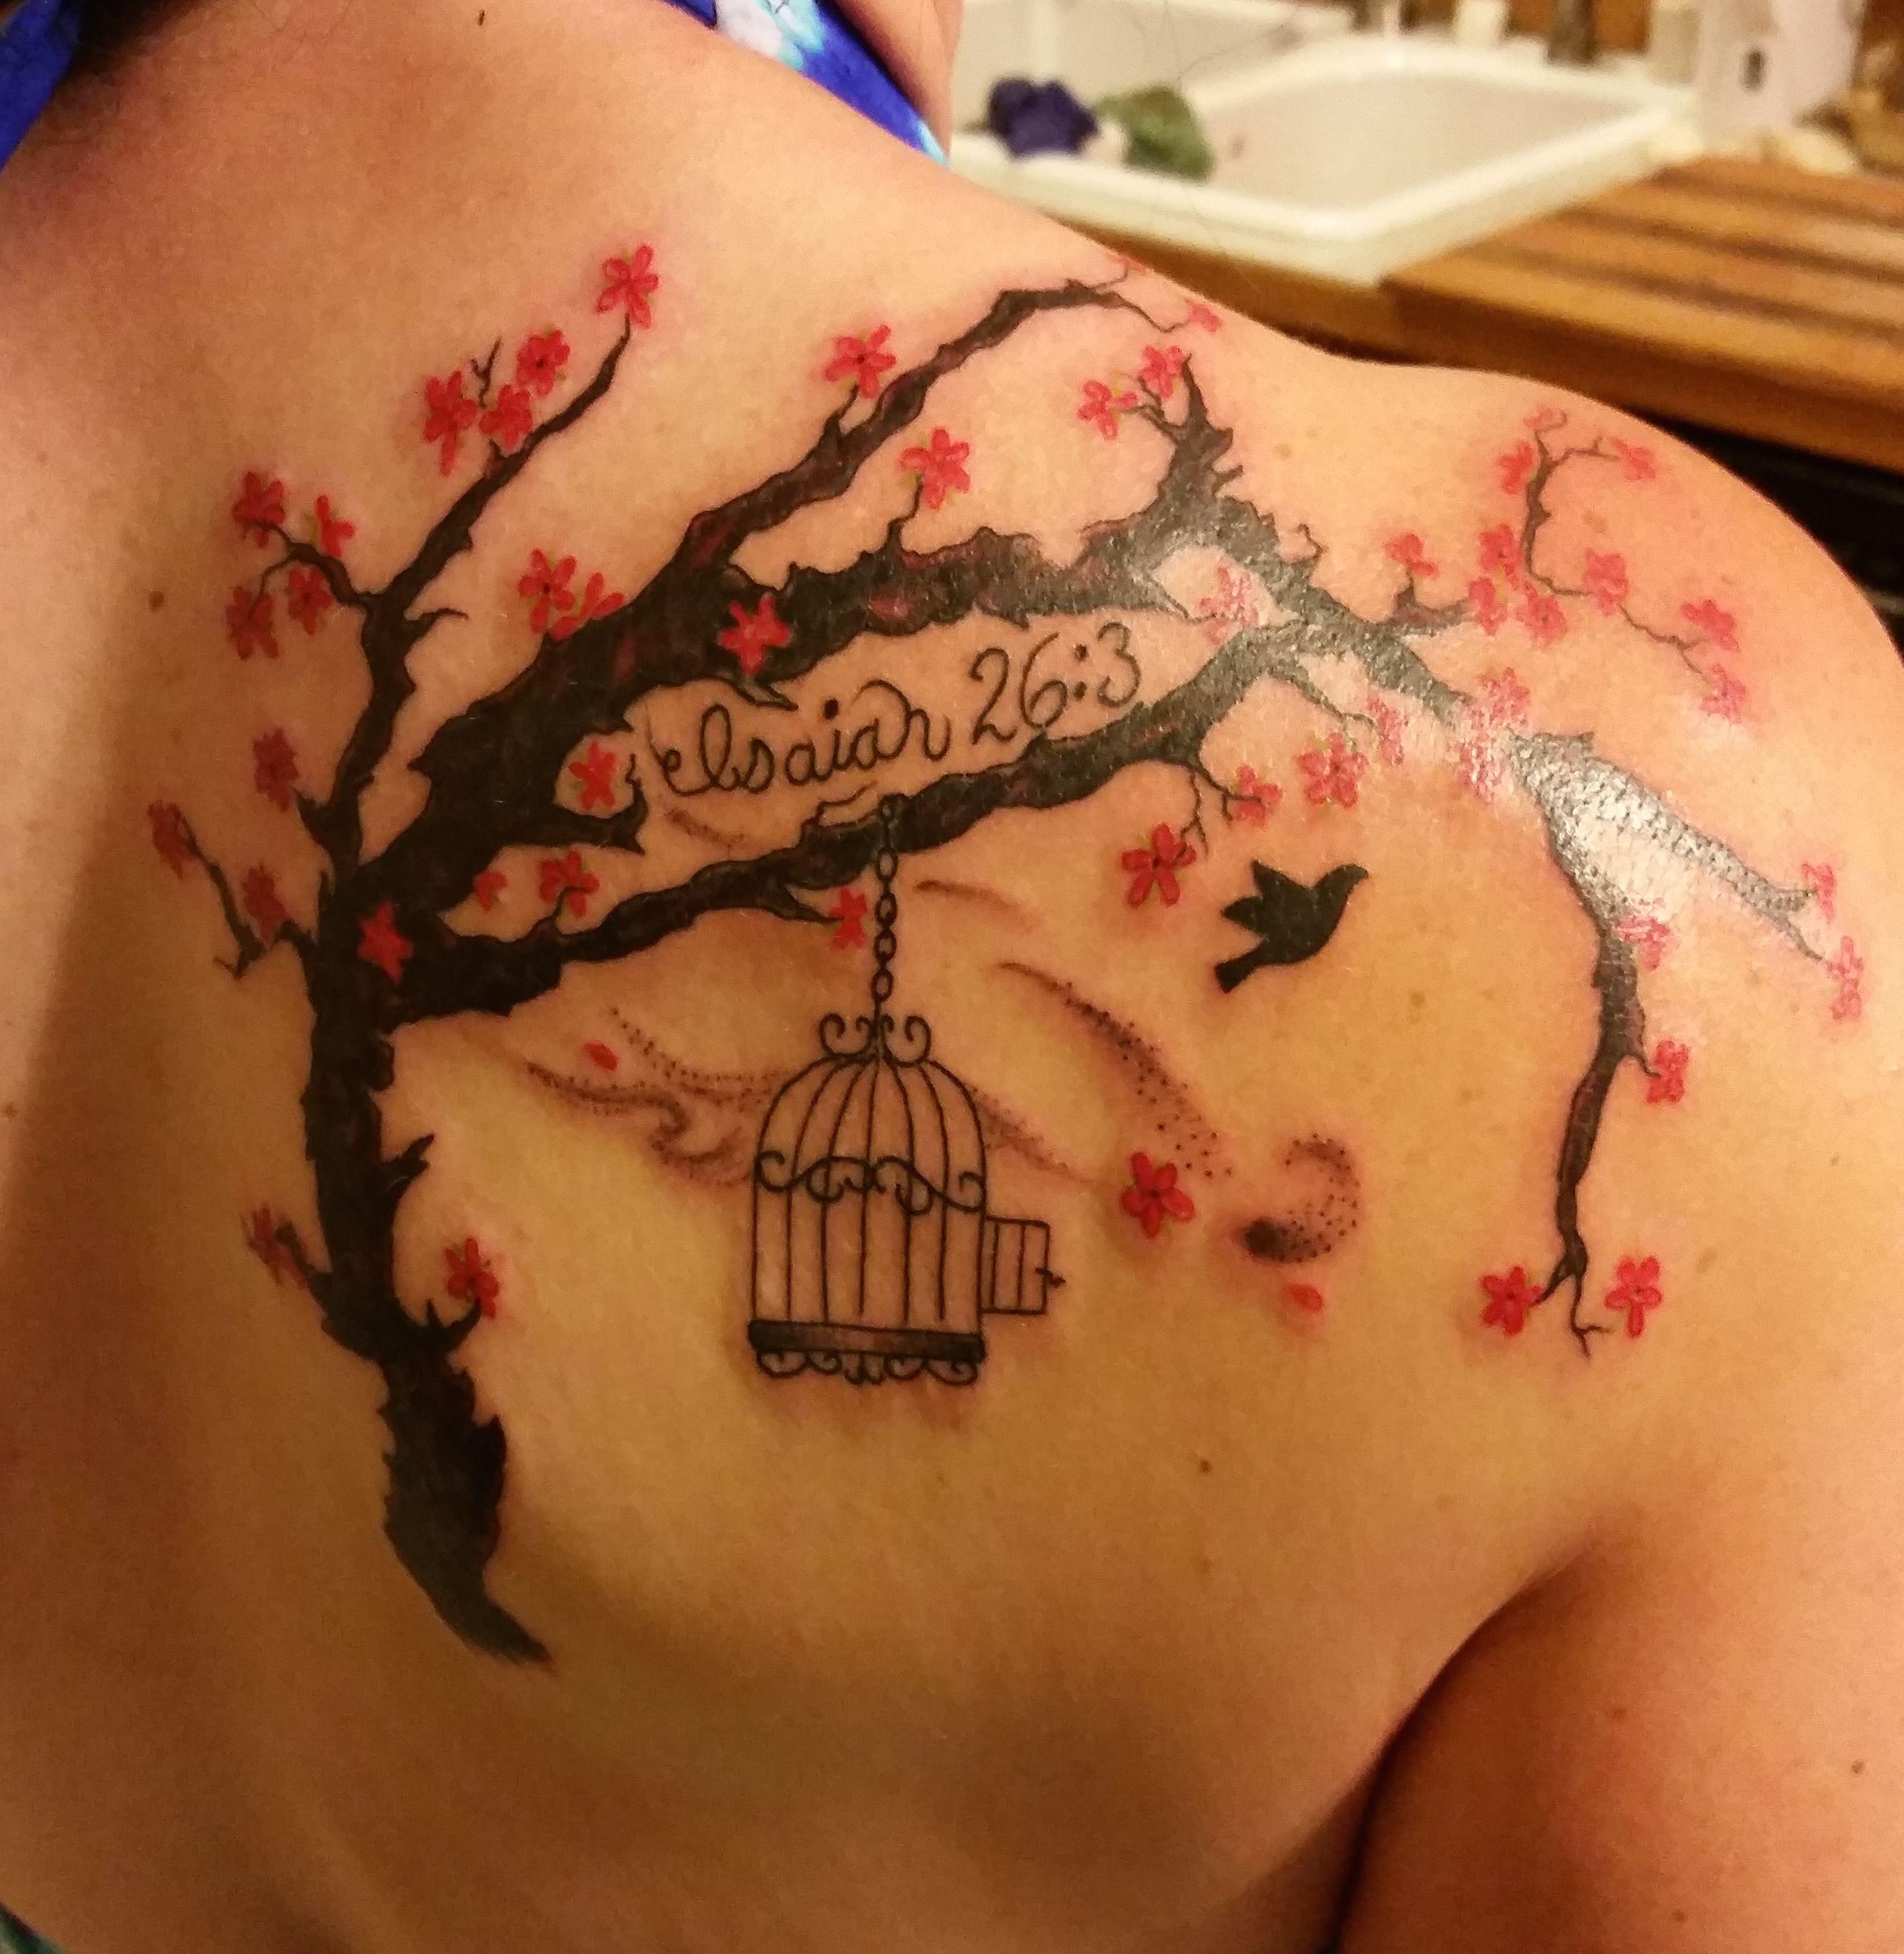 My New Tattoo Cherry Blossom Tree Isaiah 26 3 And A Bird Flying Free This Is My Mom Tattoos Freedom Tattoos Birds Tattoo